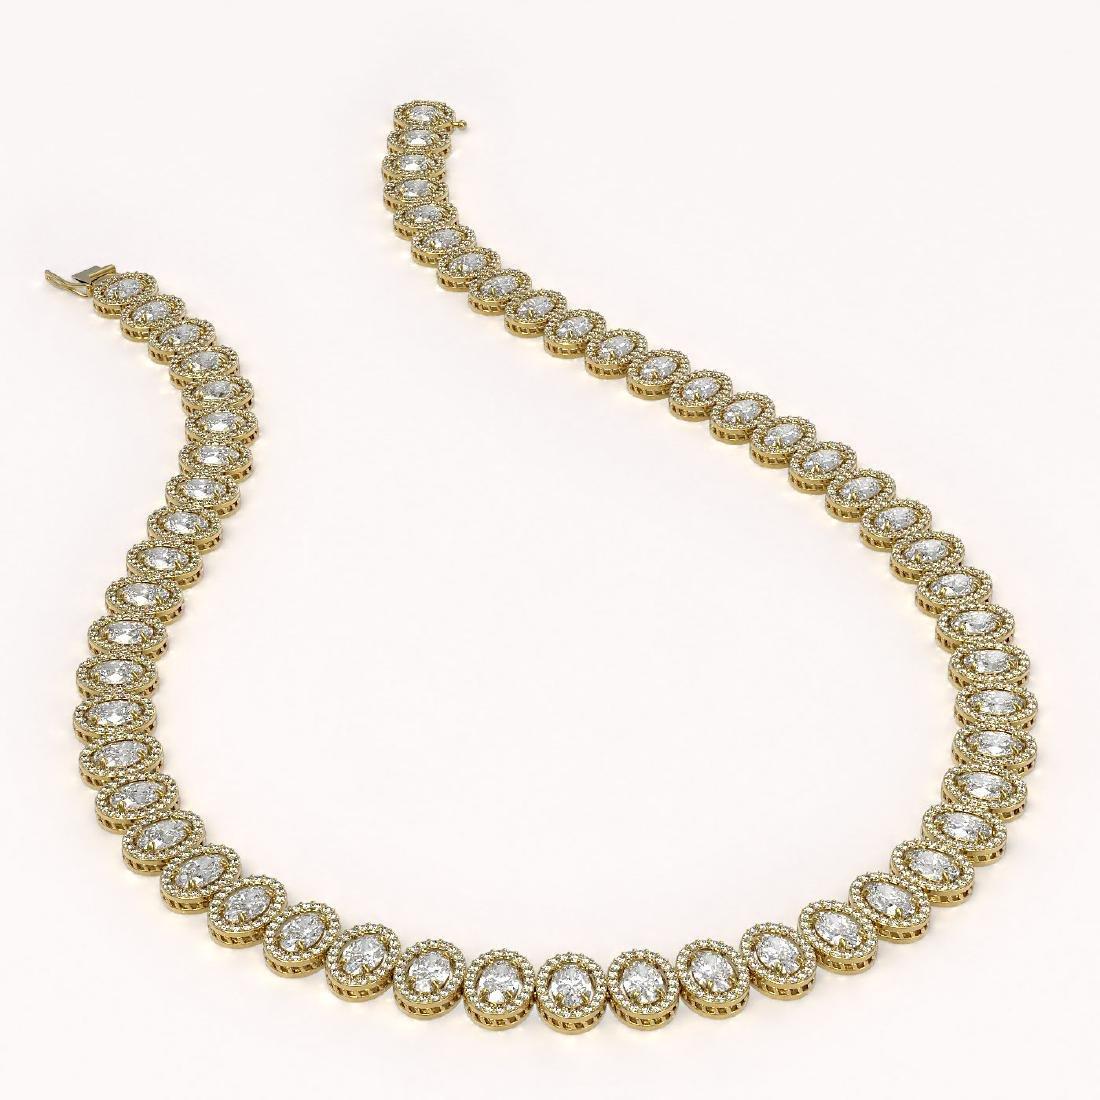 34.72 CTW Oval Diamond Designer Necklace 18K Yellow - 2